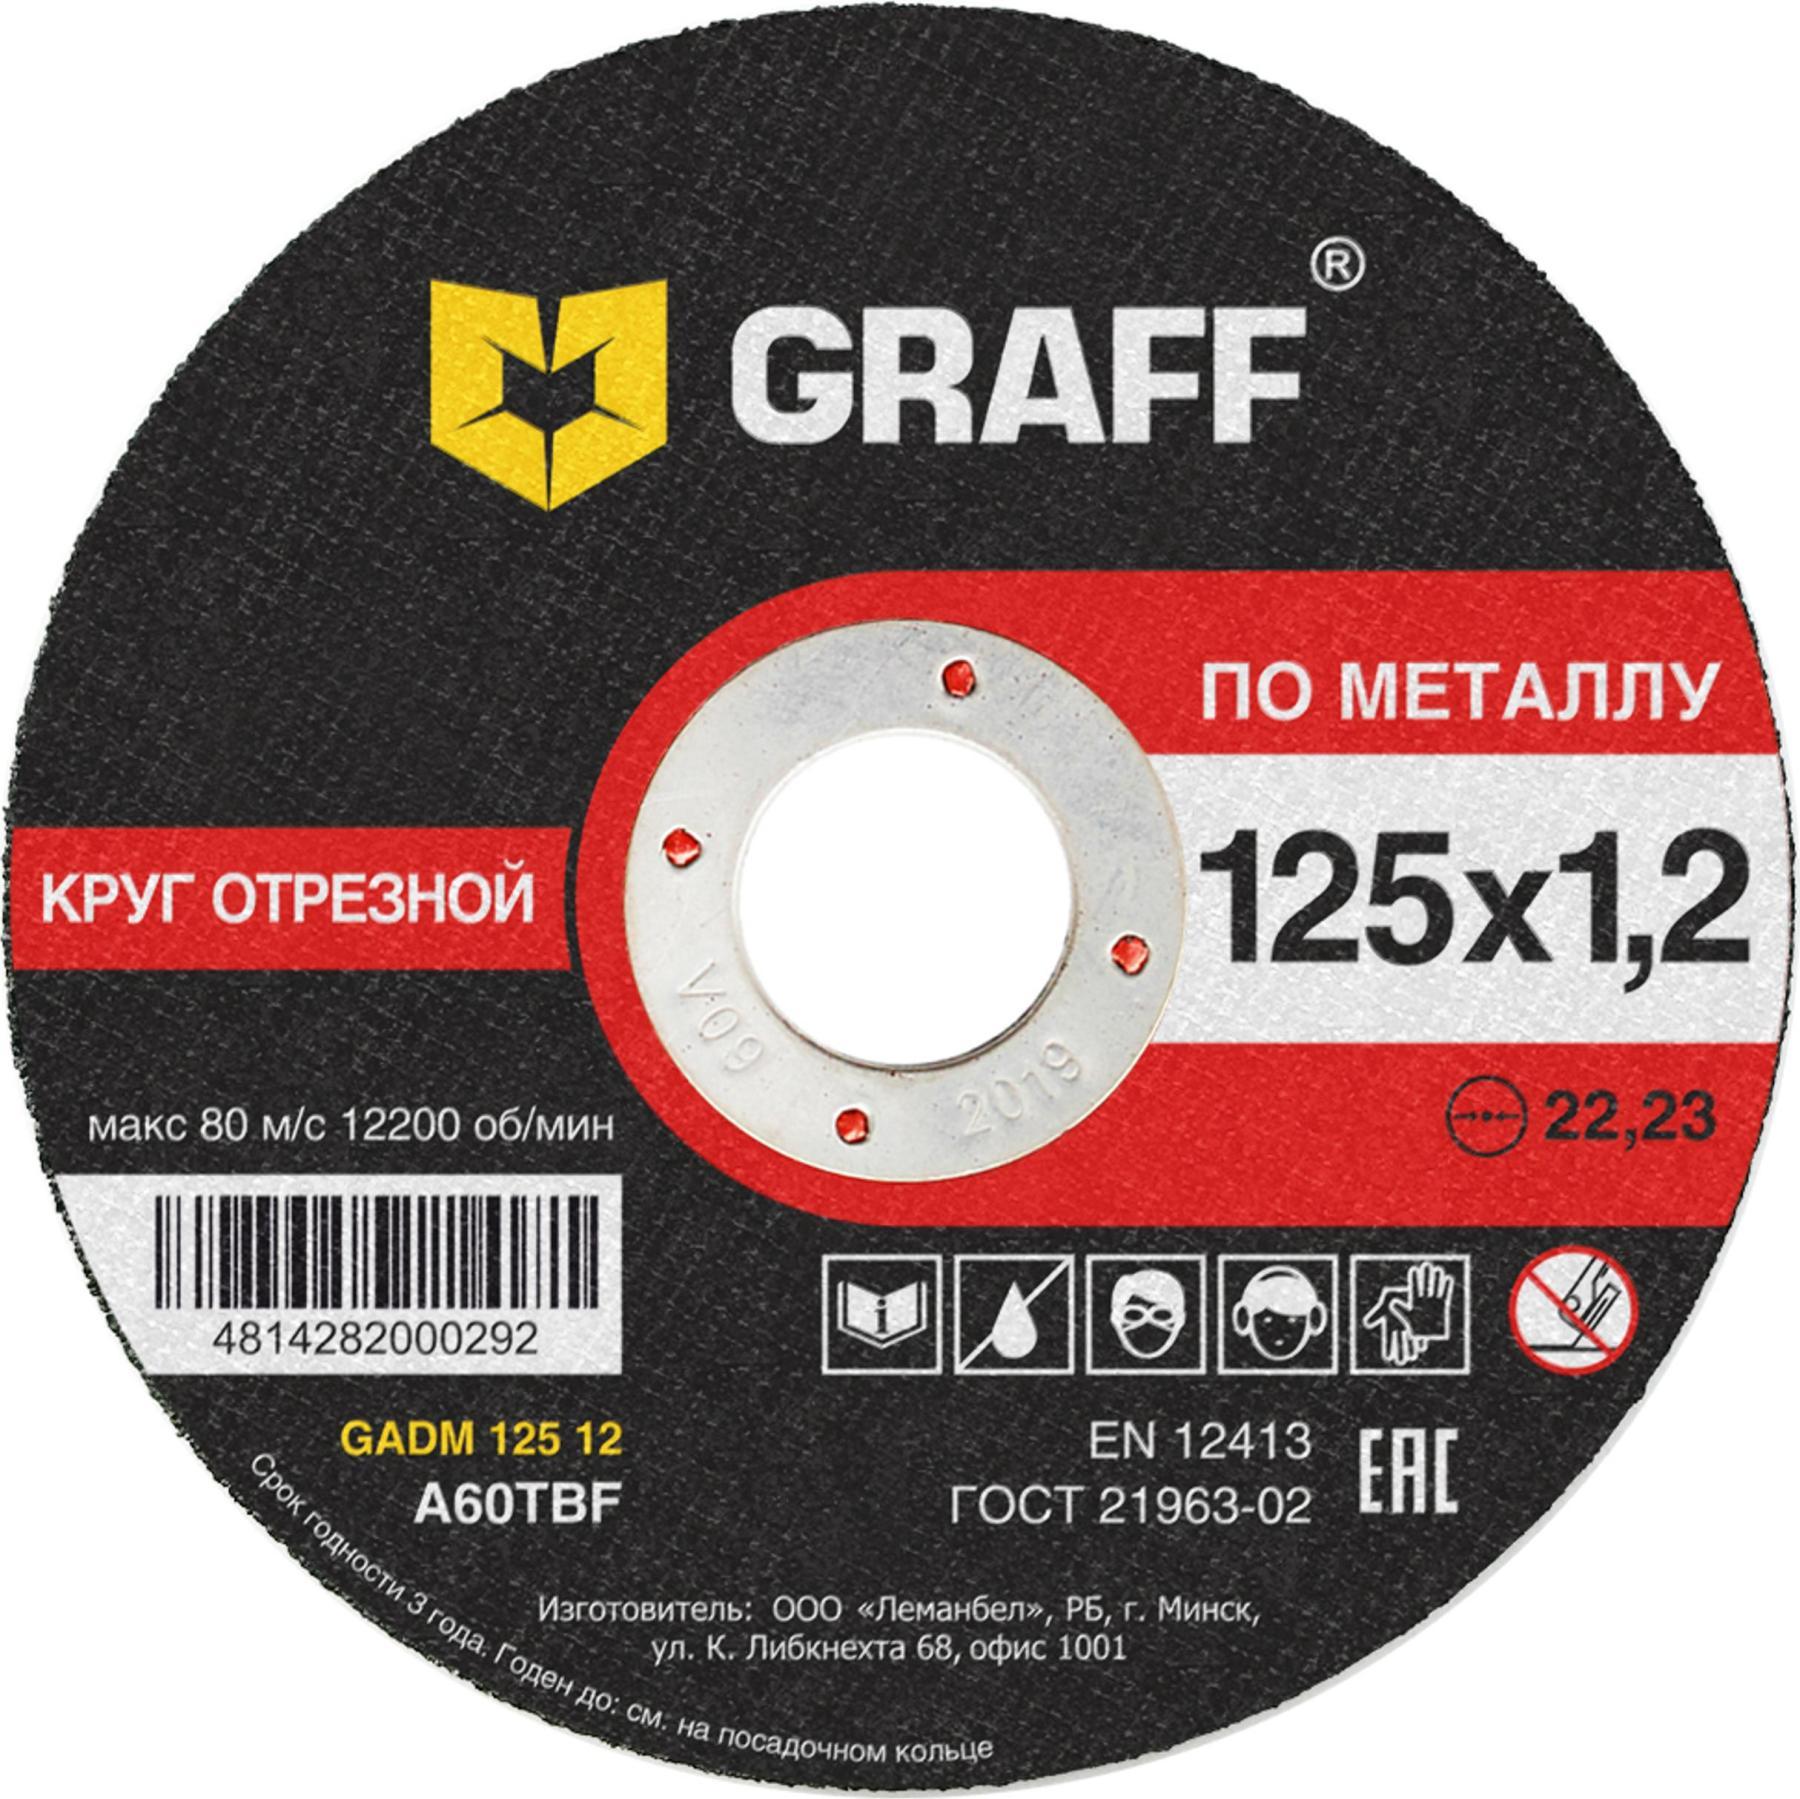 Circle Cutting GRAFF GADM 125 12